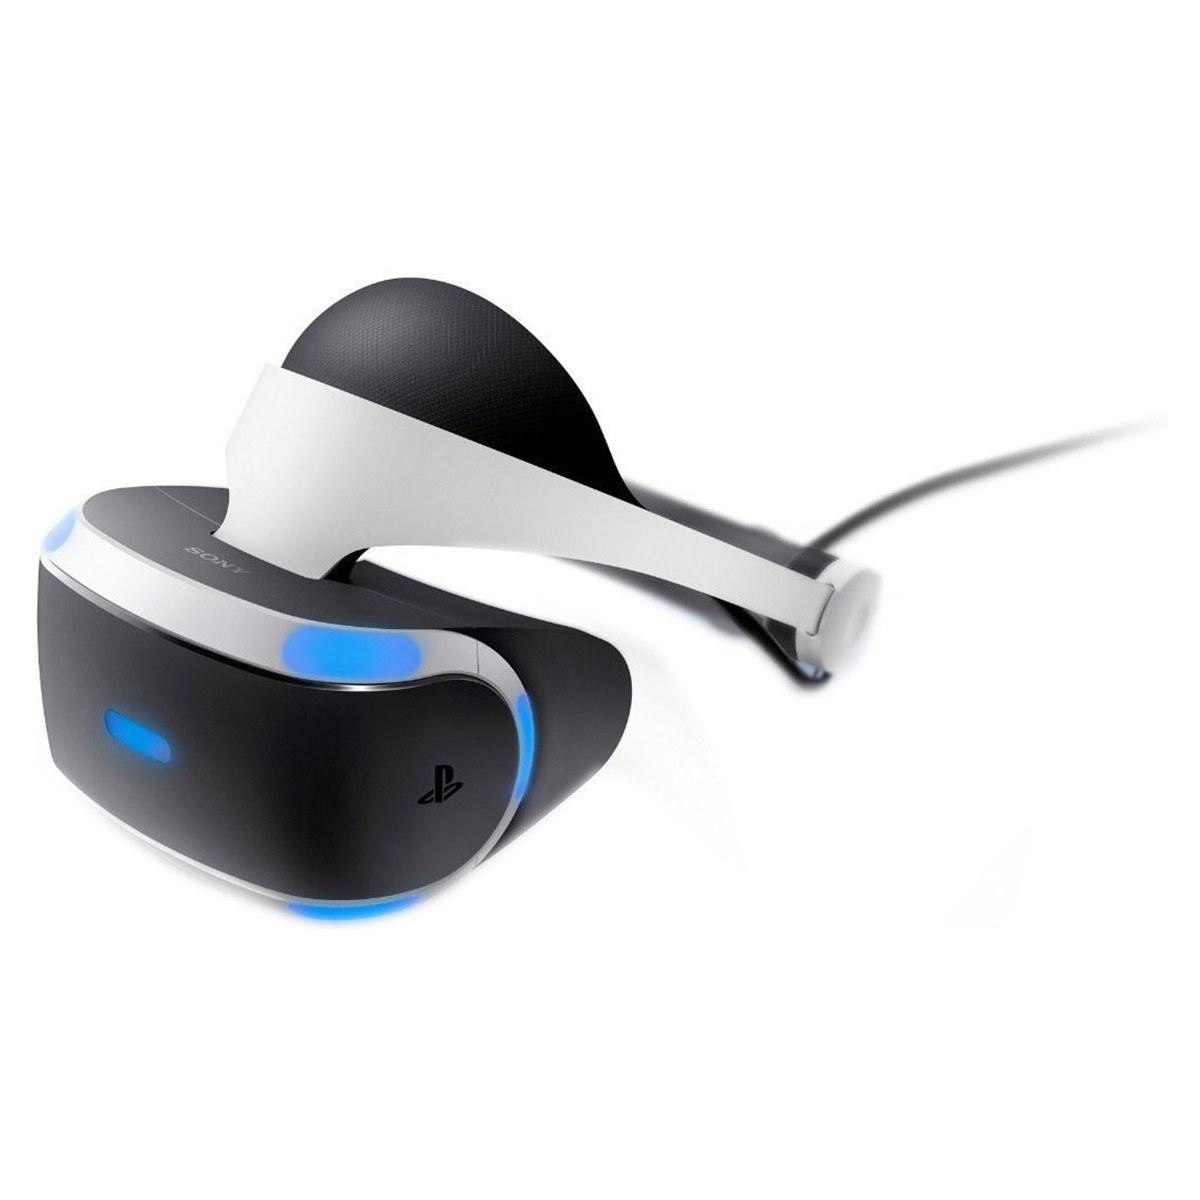 باندل واقعیت مجازی سونی مدل PlayStation VR | Sony PlayStation VR Bundle